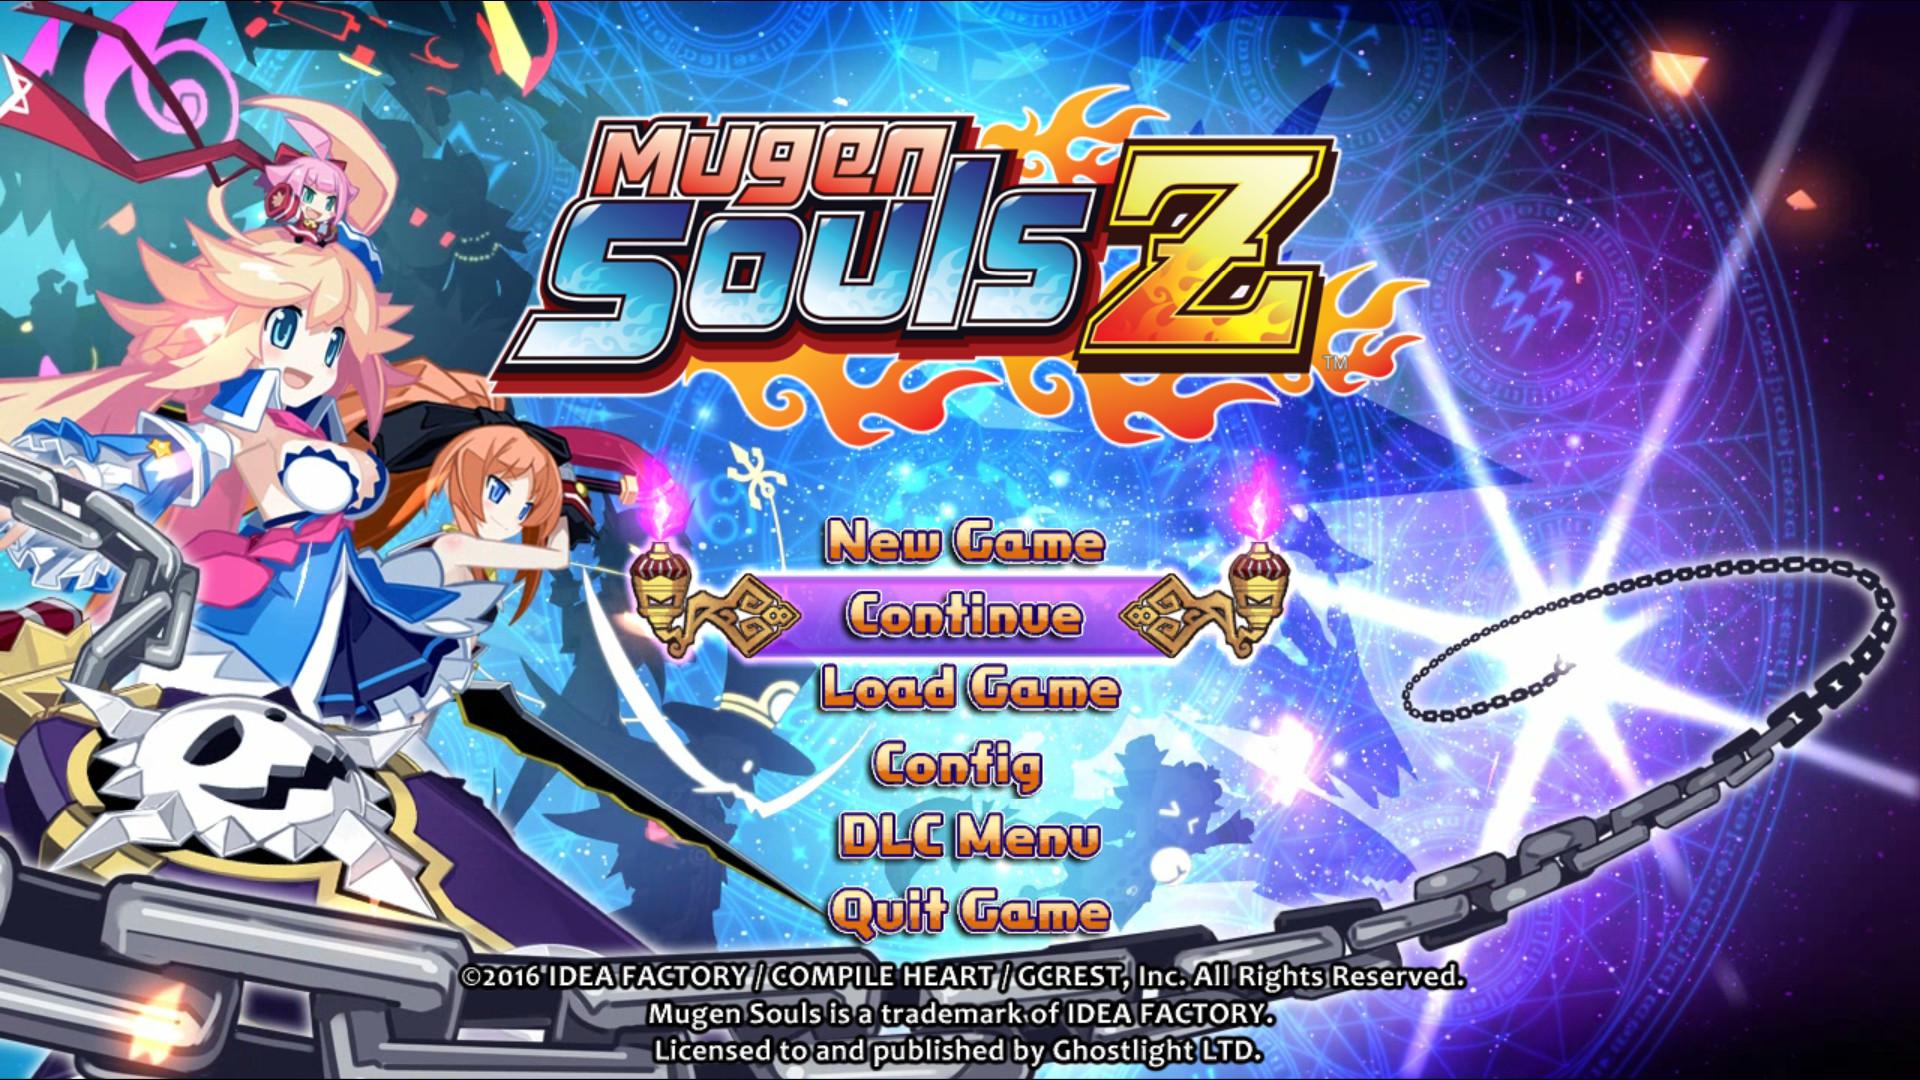 Mugen Souls Z - Clothing Bundle 1 screenshot